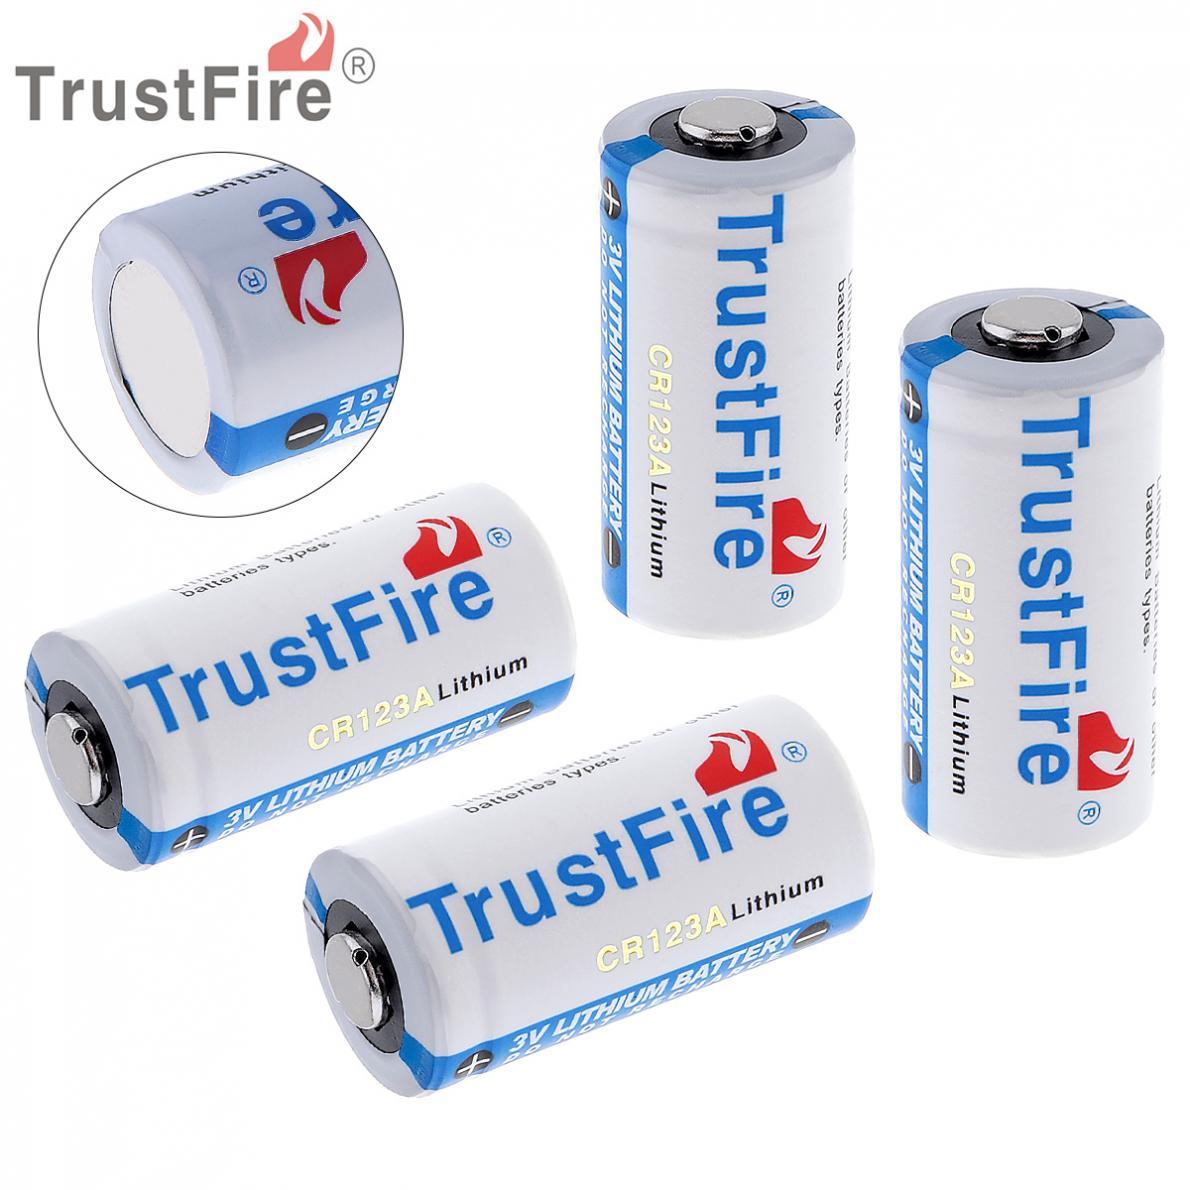 Trustfire 4pcs High Quality CR123A 16340 Lithium Li-ion Batteries Trustfire 3V Battery 1400mAh lc 16340 3 7v 1000mah li ion batteries yellow 2 battery pack